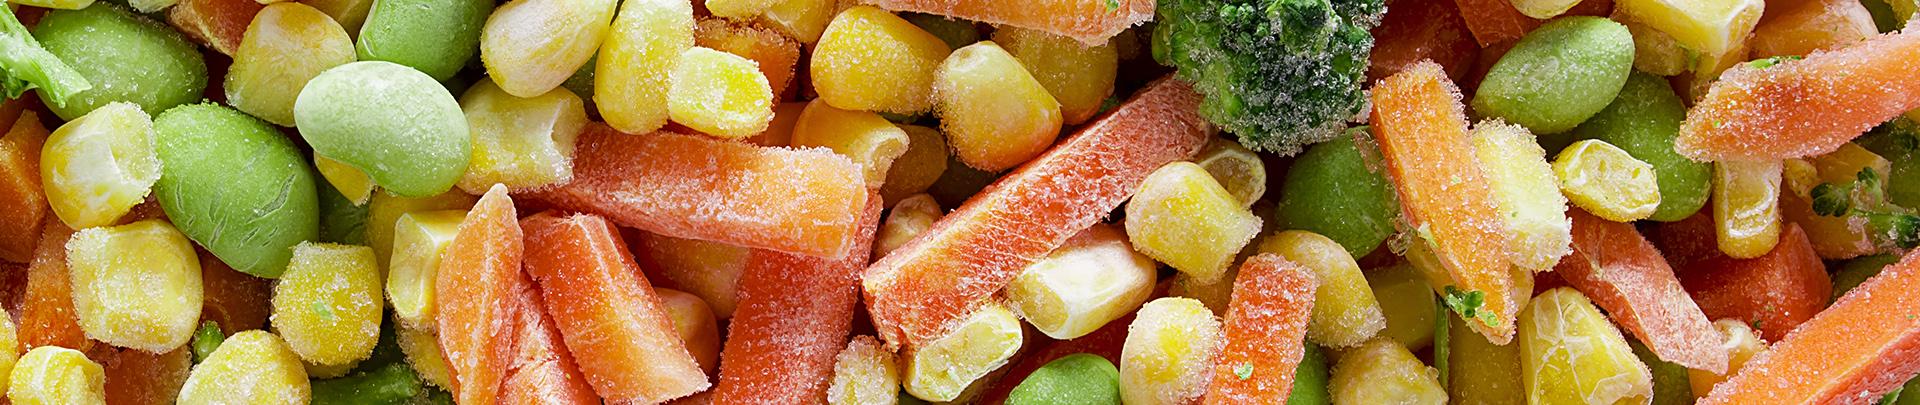 dolcelinea ingredienti surgelato verdura